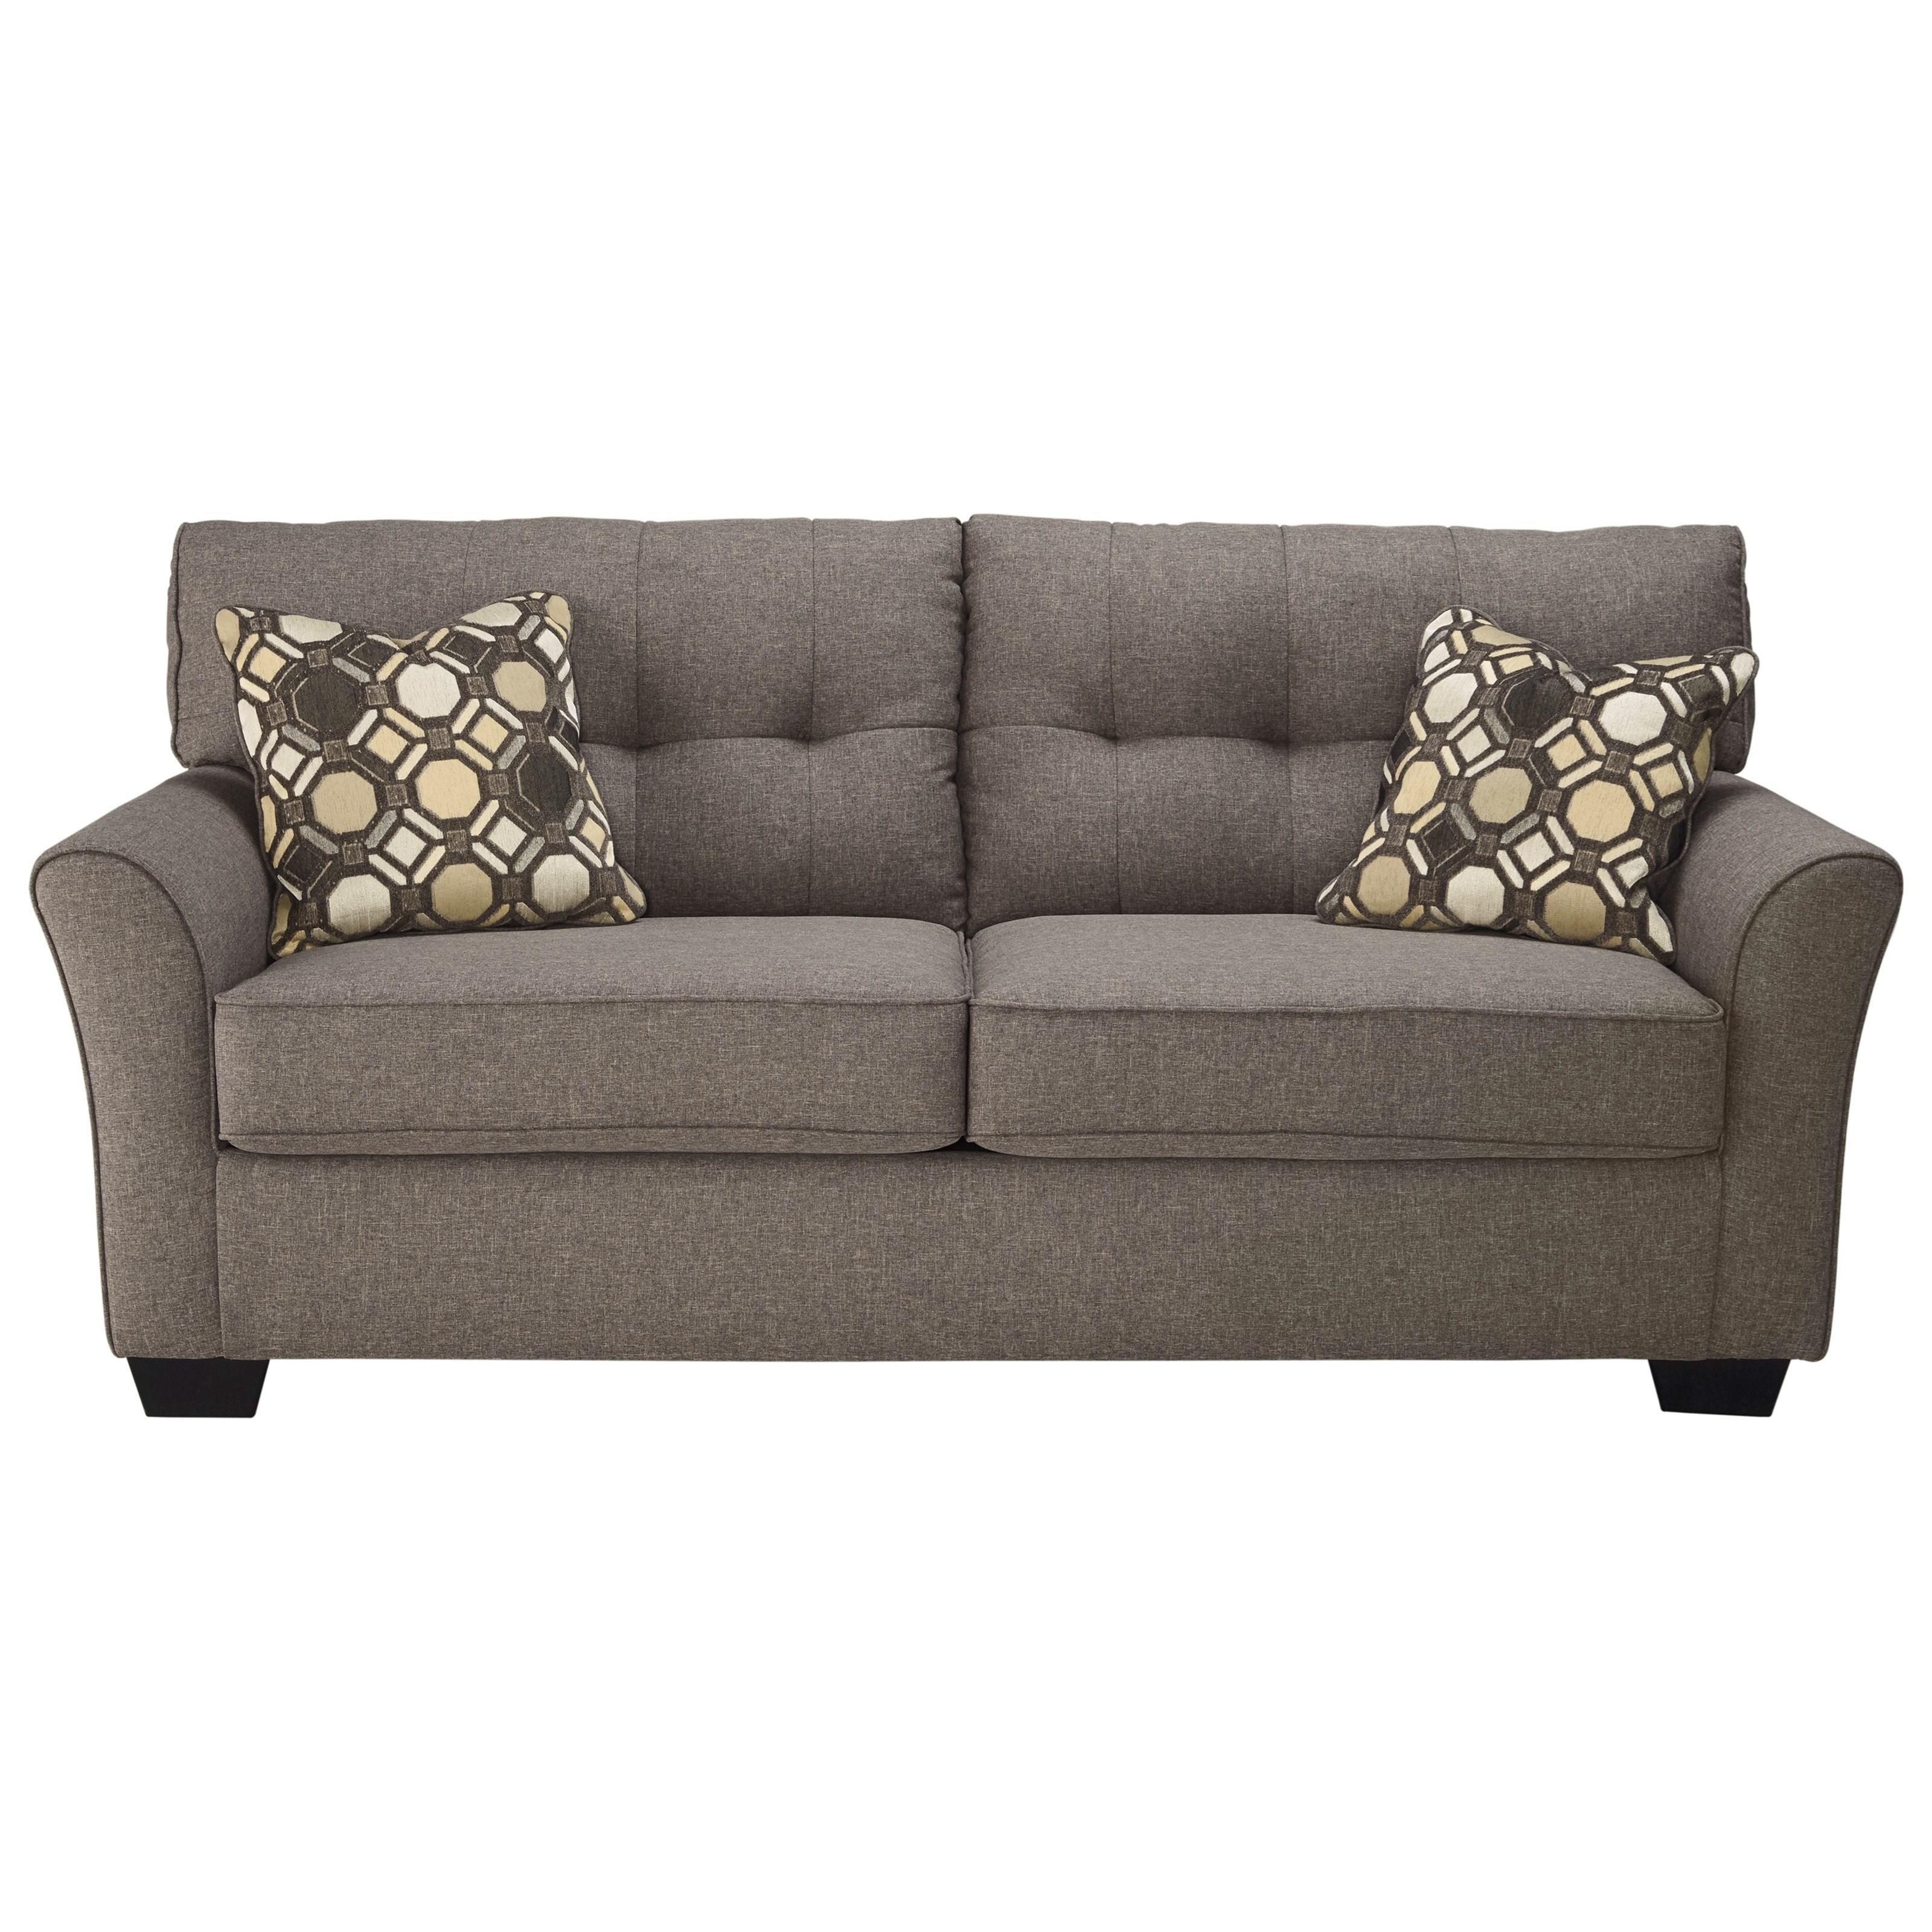 Signature Design By Ashley Tibbee Contemporary Full Sofa Sleeper